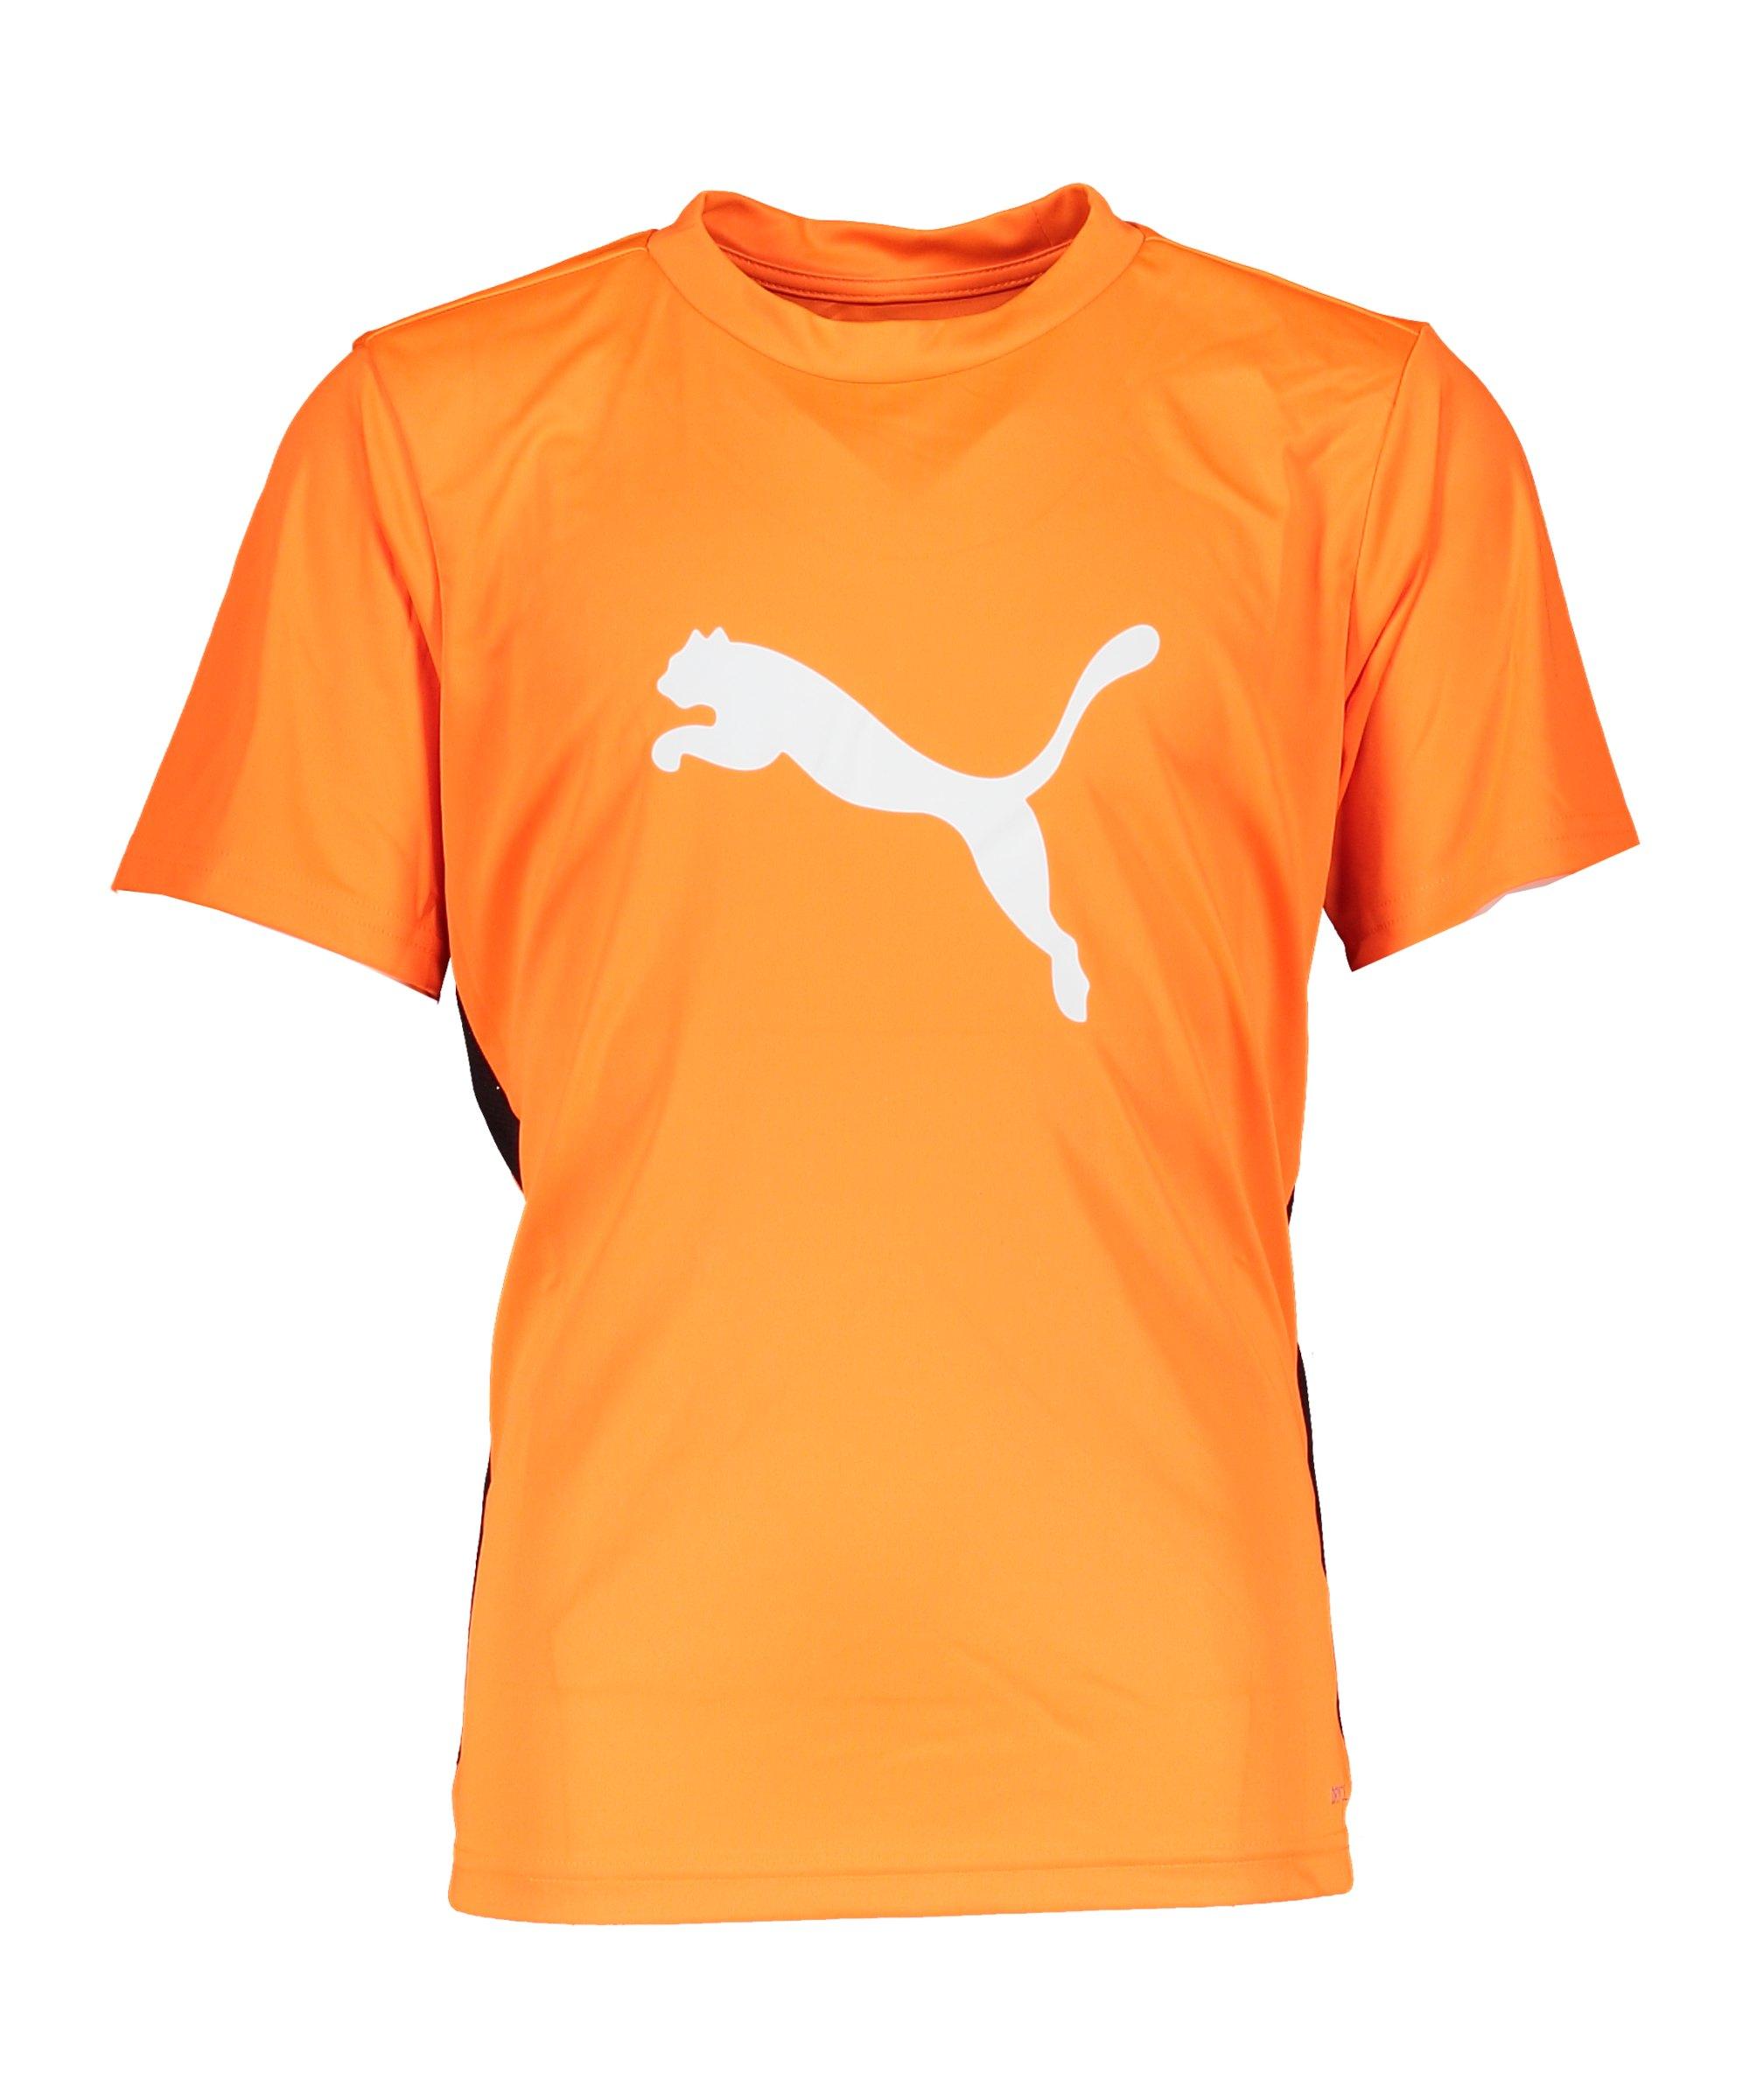 PUMA ftblPLAY Logo T-Shirt Kids Orange F20 - orange